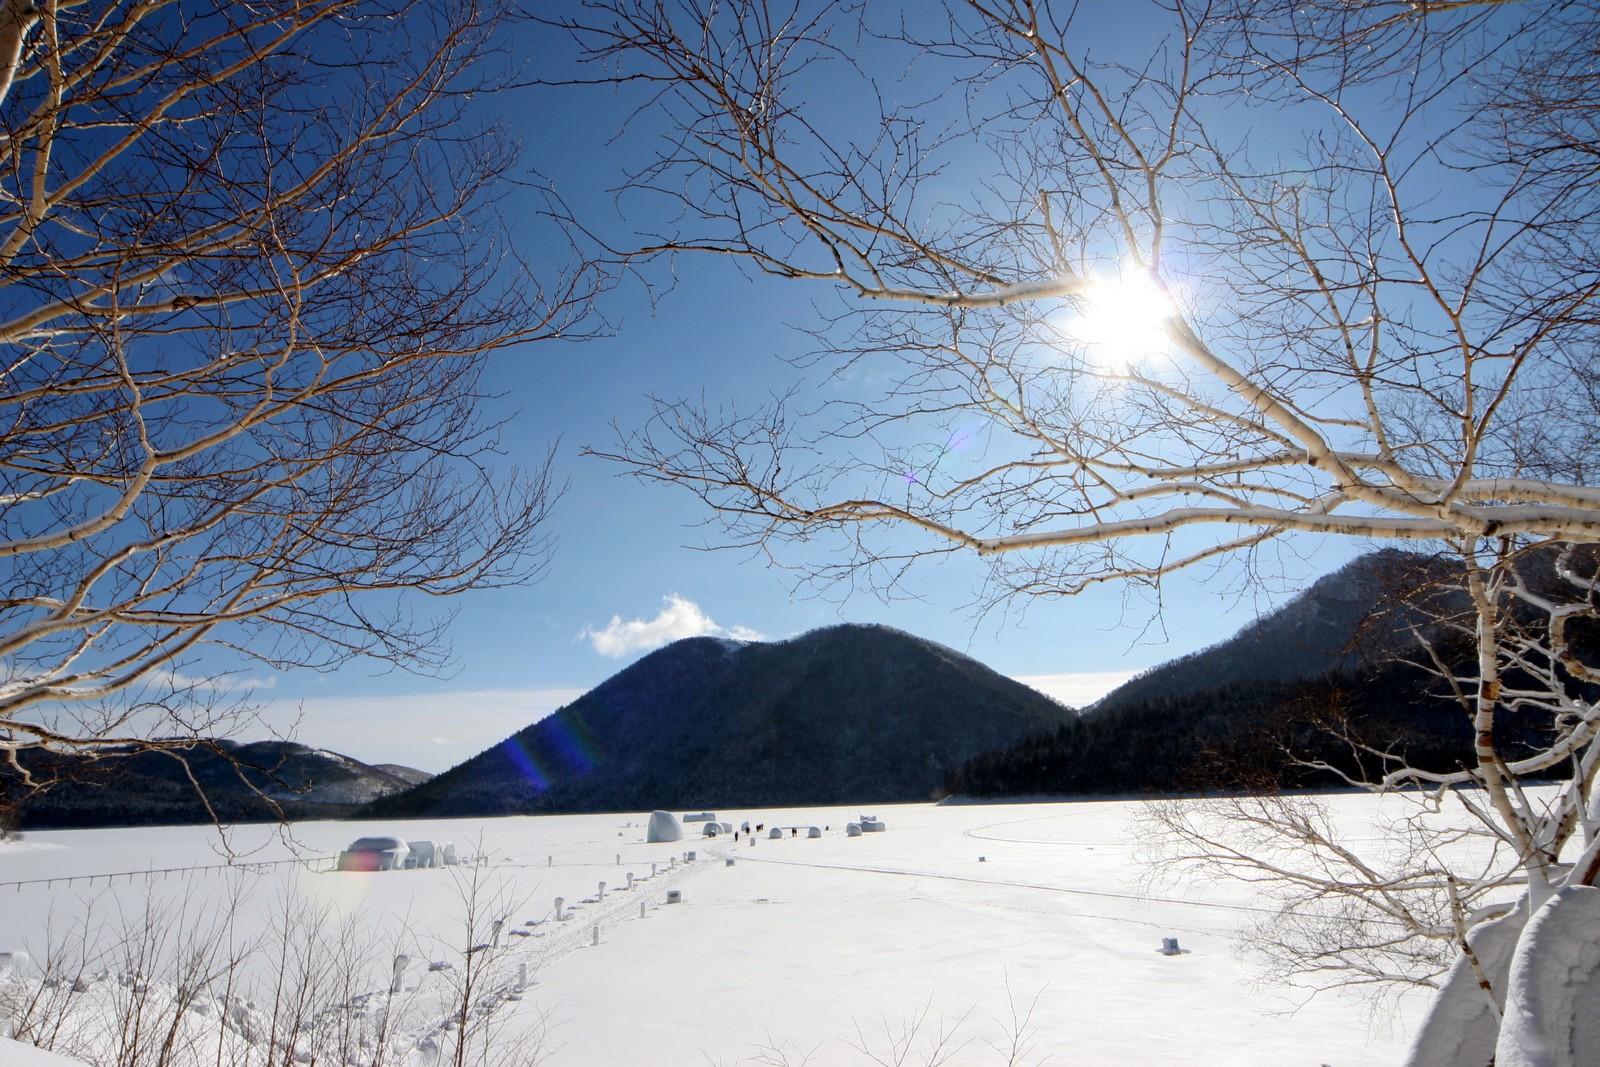 Shikaribetsu Kotan Ice Village